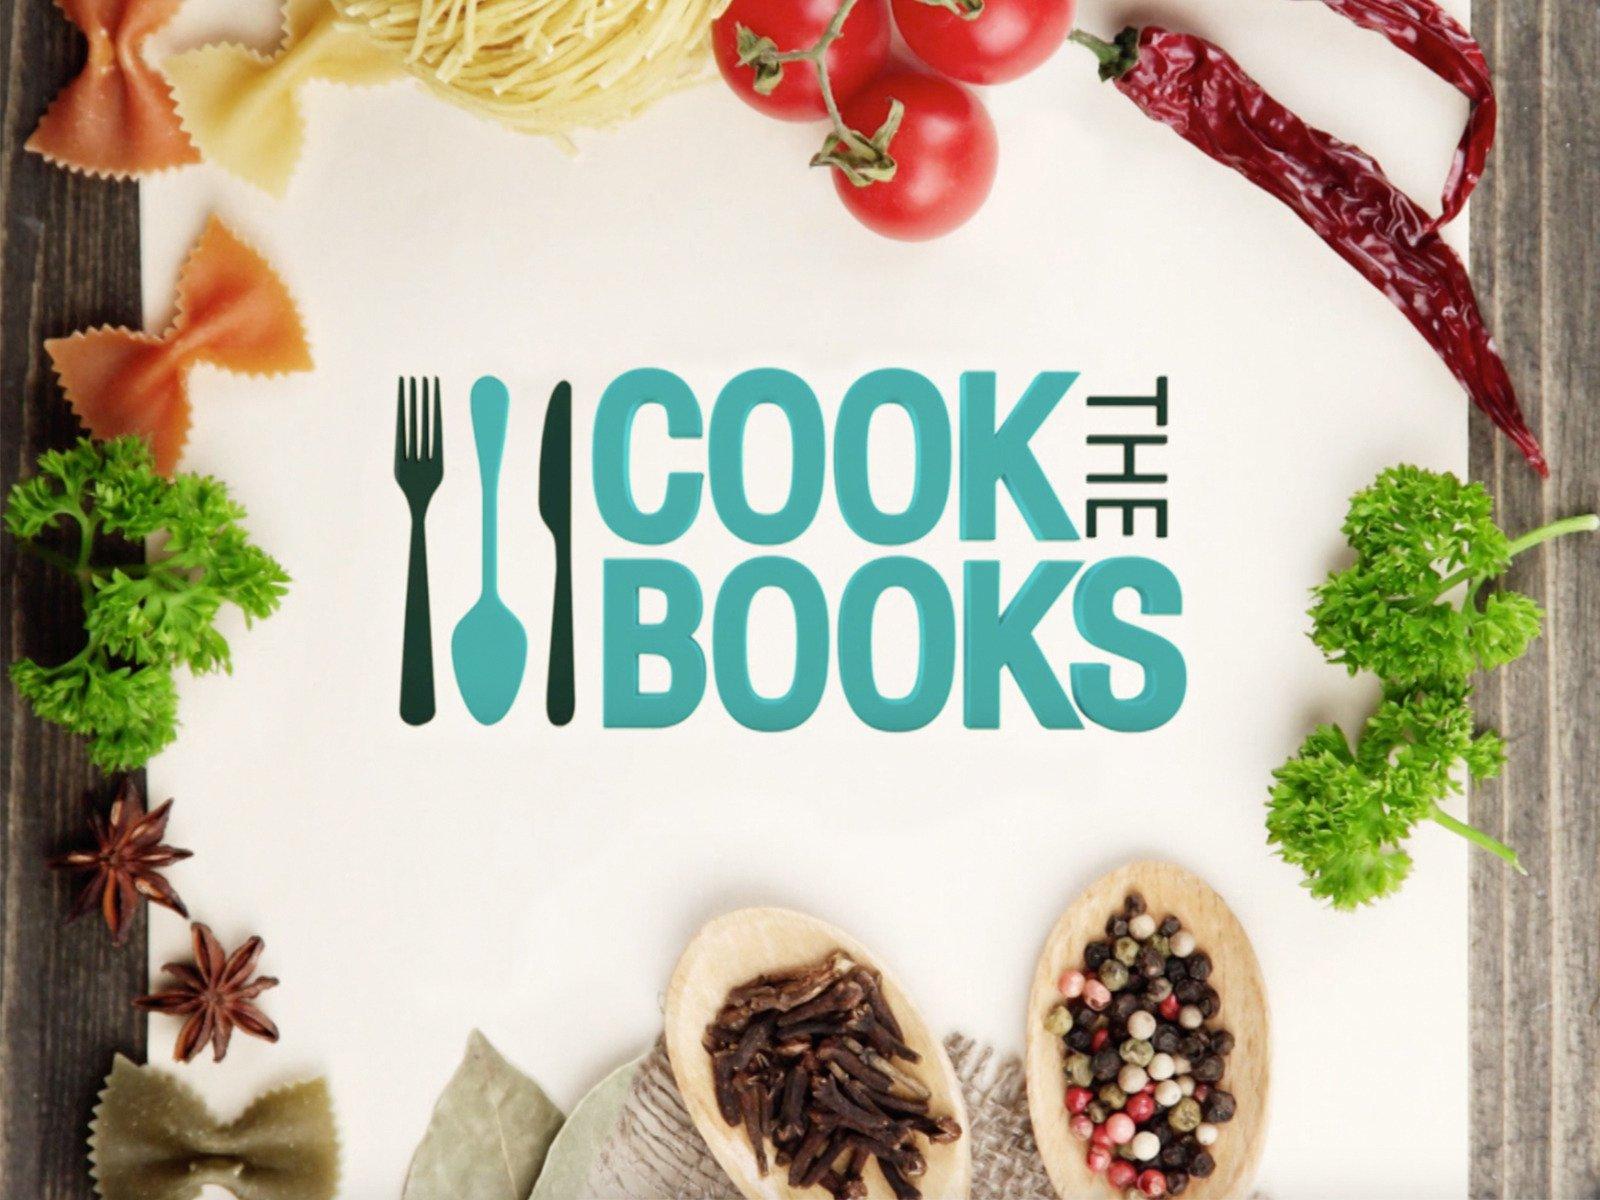 Cook the Books - Season 2